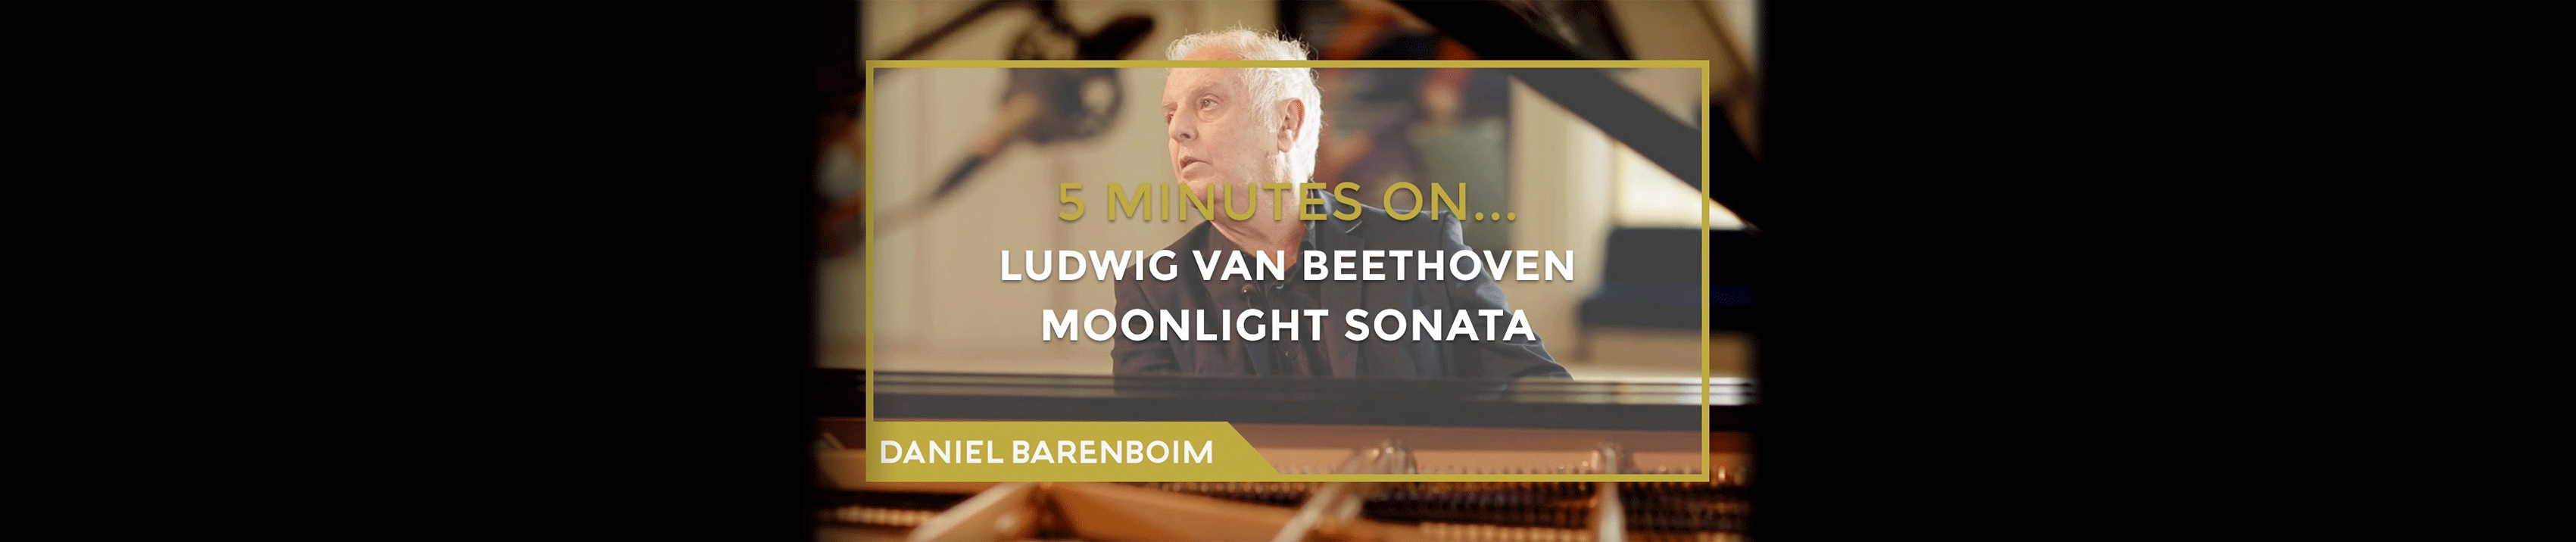 "Daniel Barenboim, Beethoven's ""Moonlight"" Sonata"